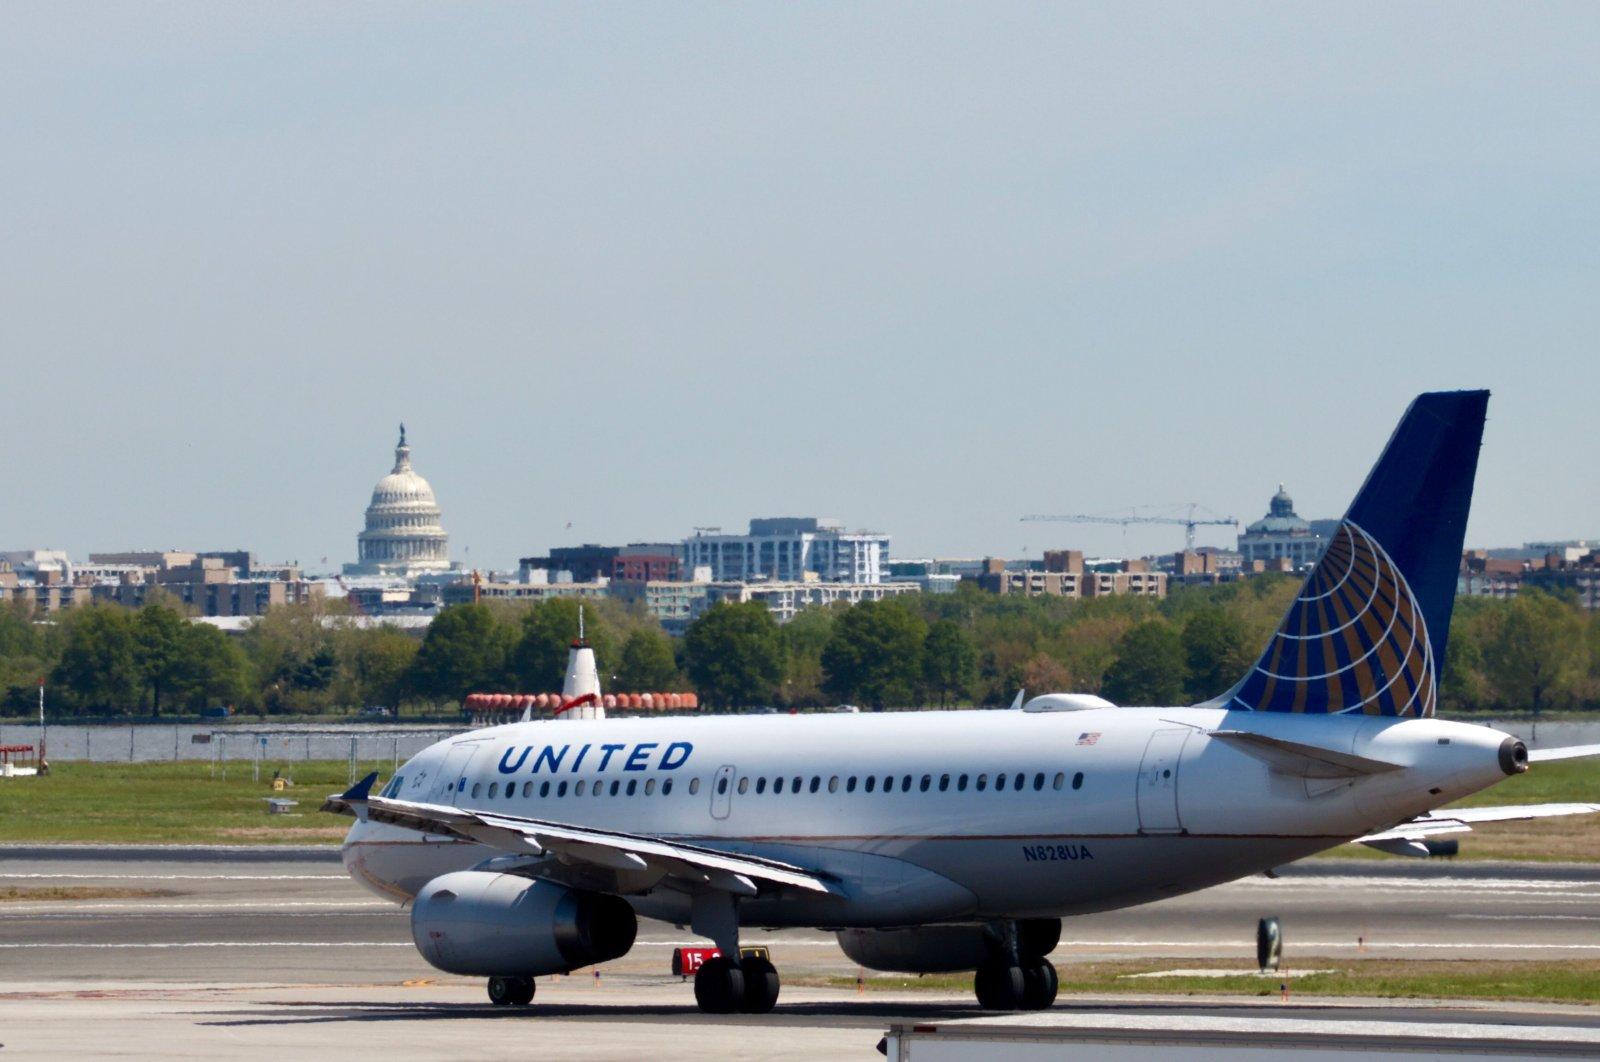 A United Airlines Airbus A319-100 taxis at Ronald Reagan Washington National Airport in Arlington, Virginia, April 23, 2019. (AFP Photo)